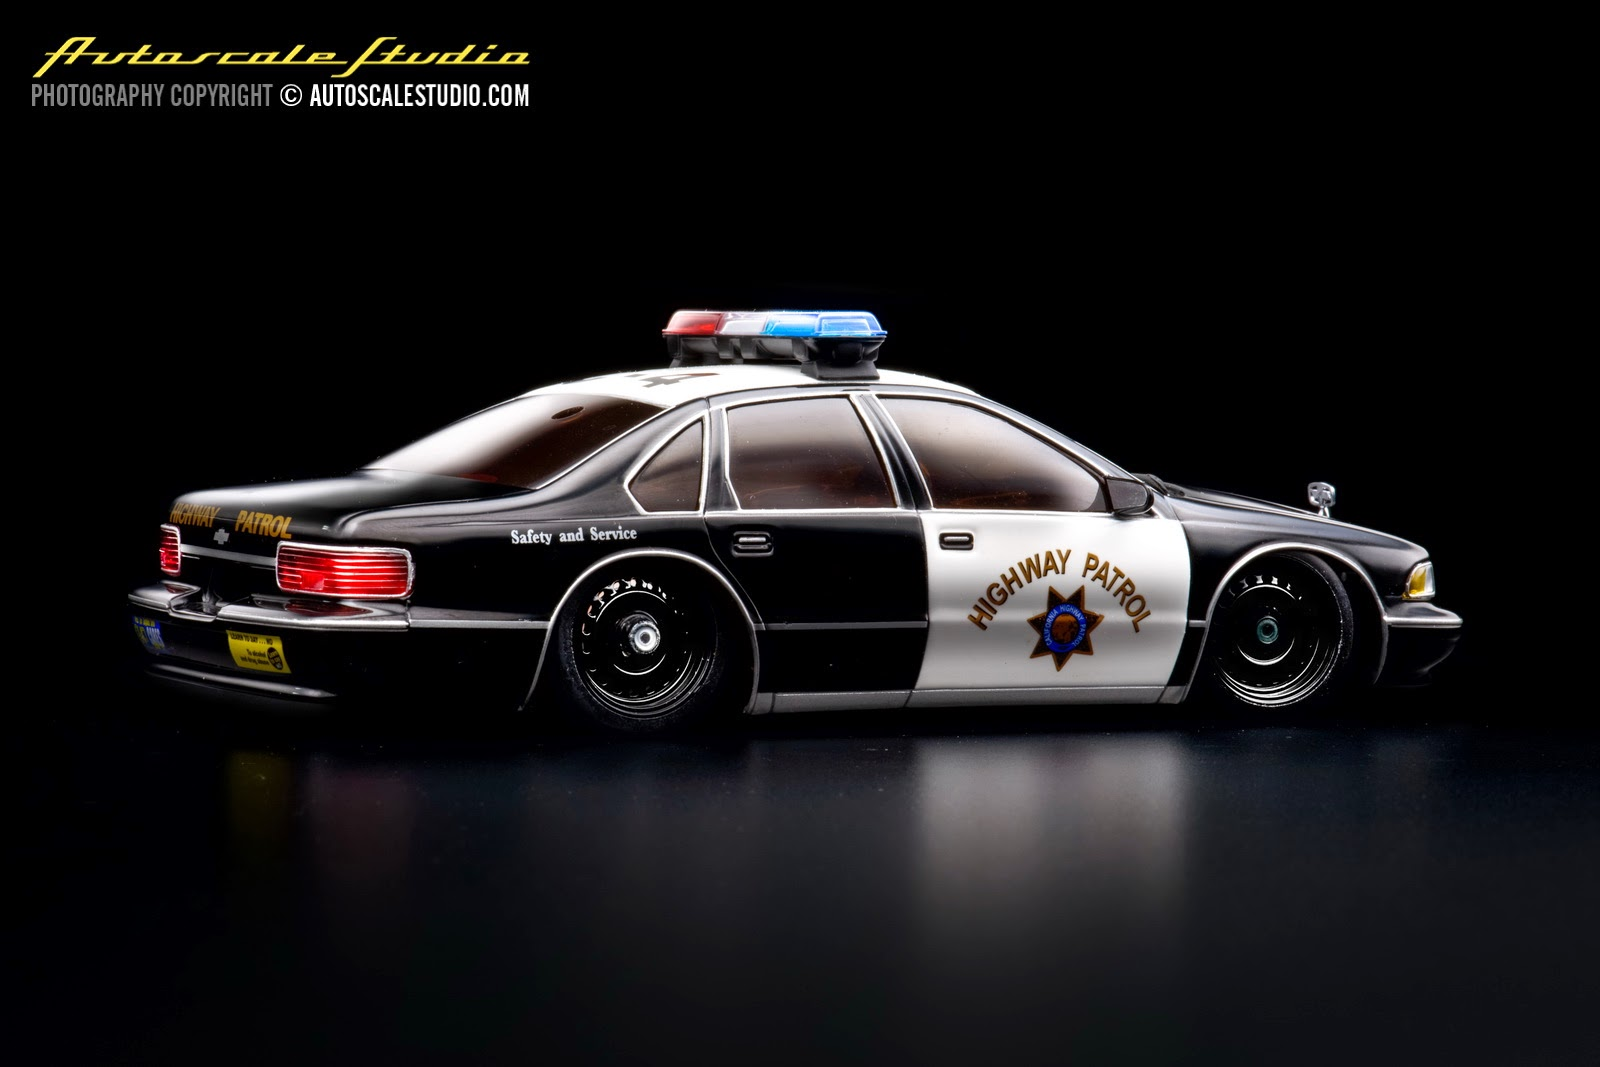 Mzg107p chevrolet caprice 9c1 1996 police car